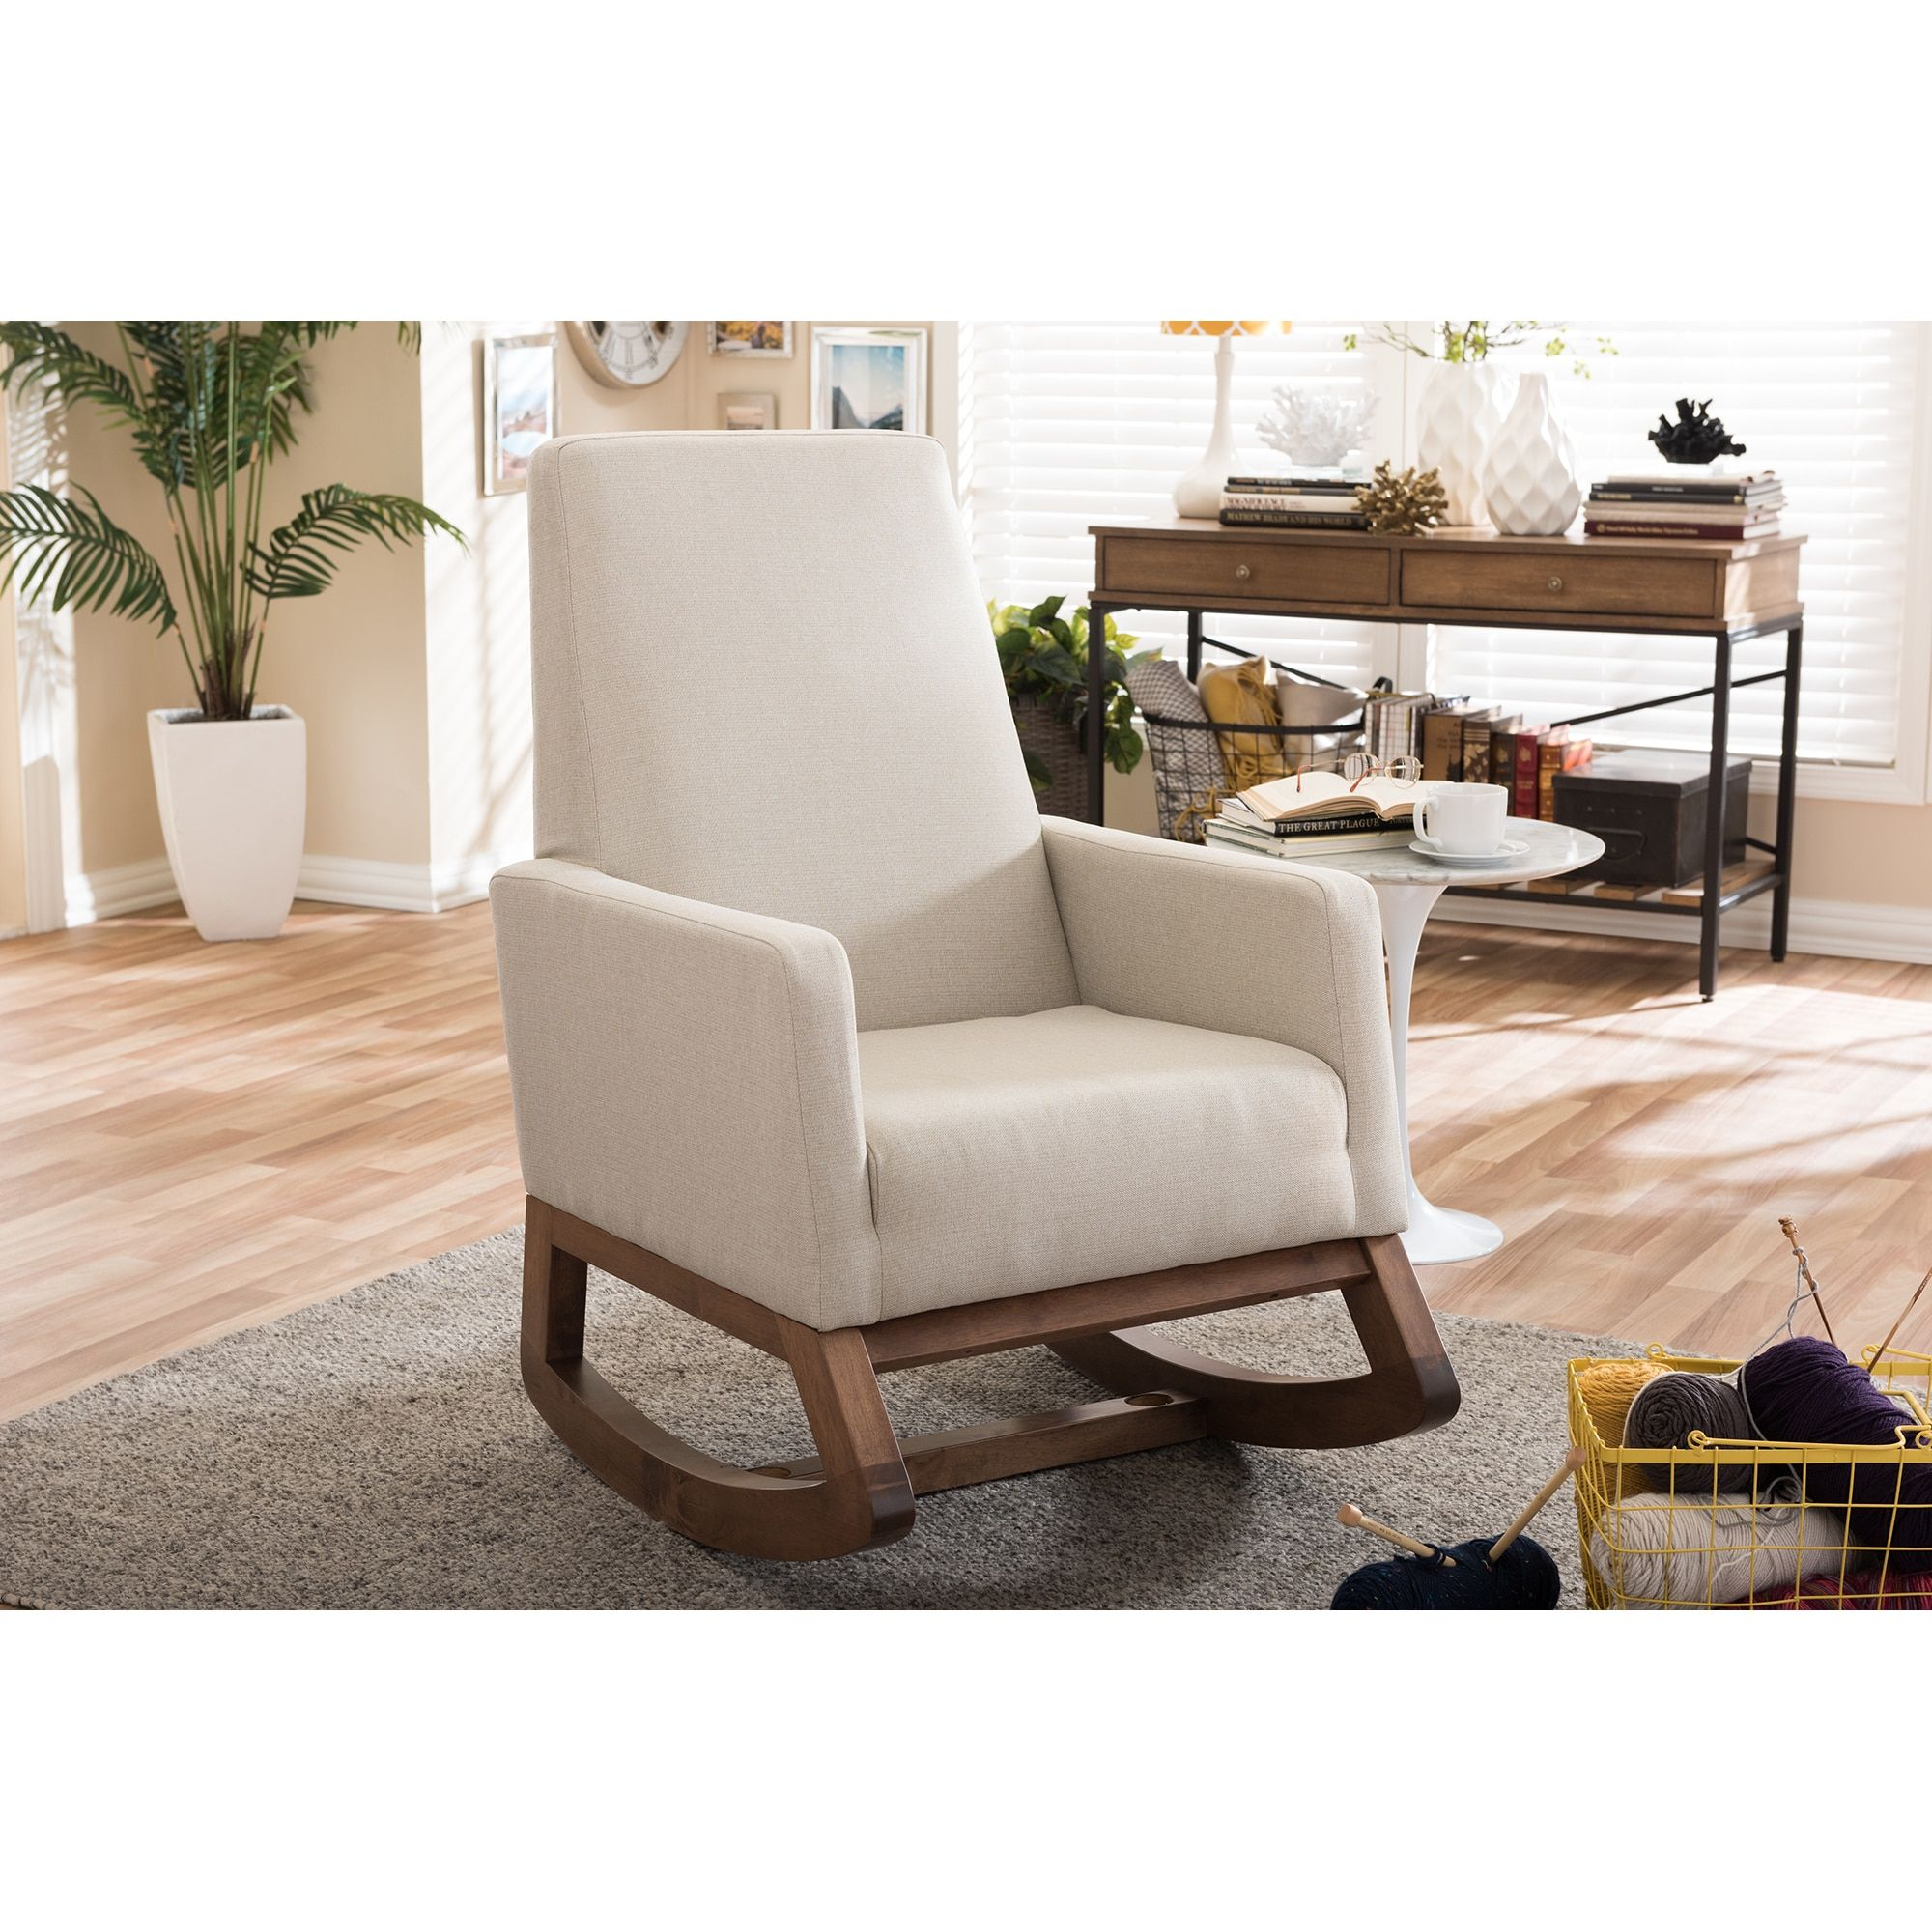 Upholstered rocking chairs baxton studio yashiya midcentury retro modern light beige fabric